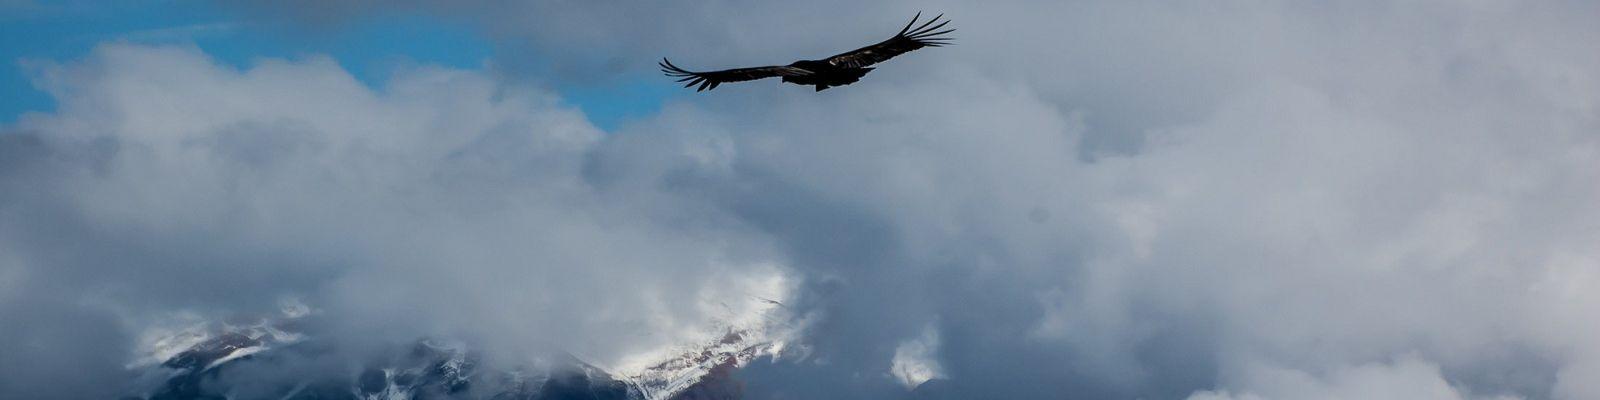 Colca - voyager au Pérou - agence voyage perou bolivie